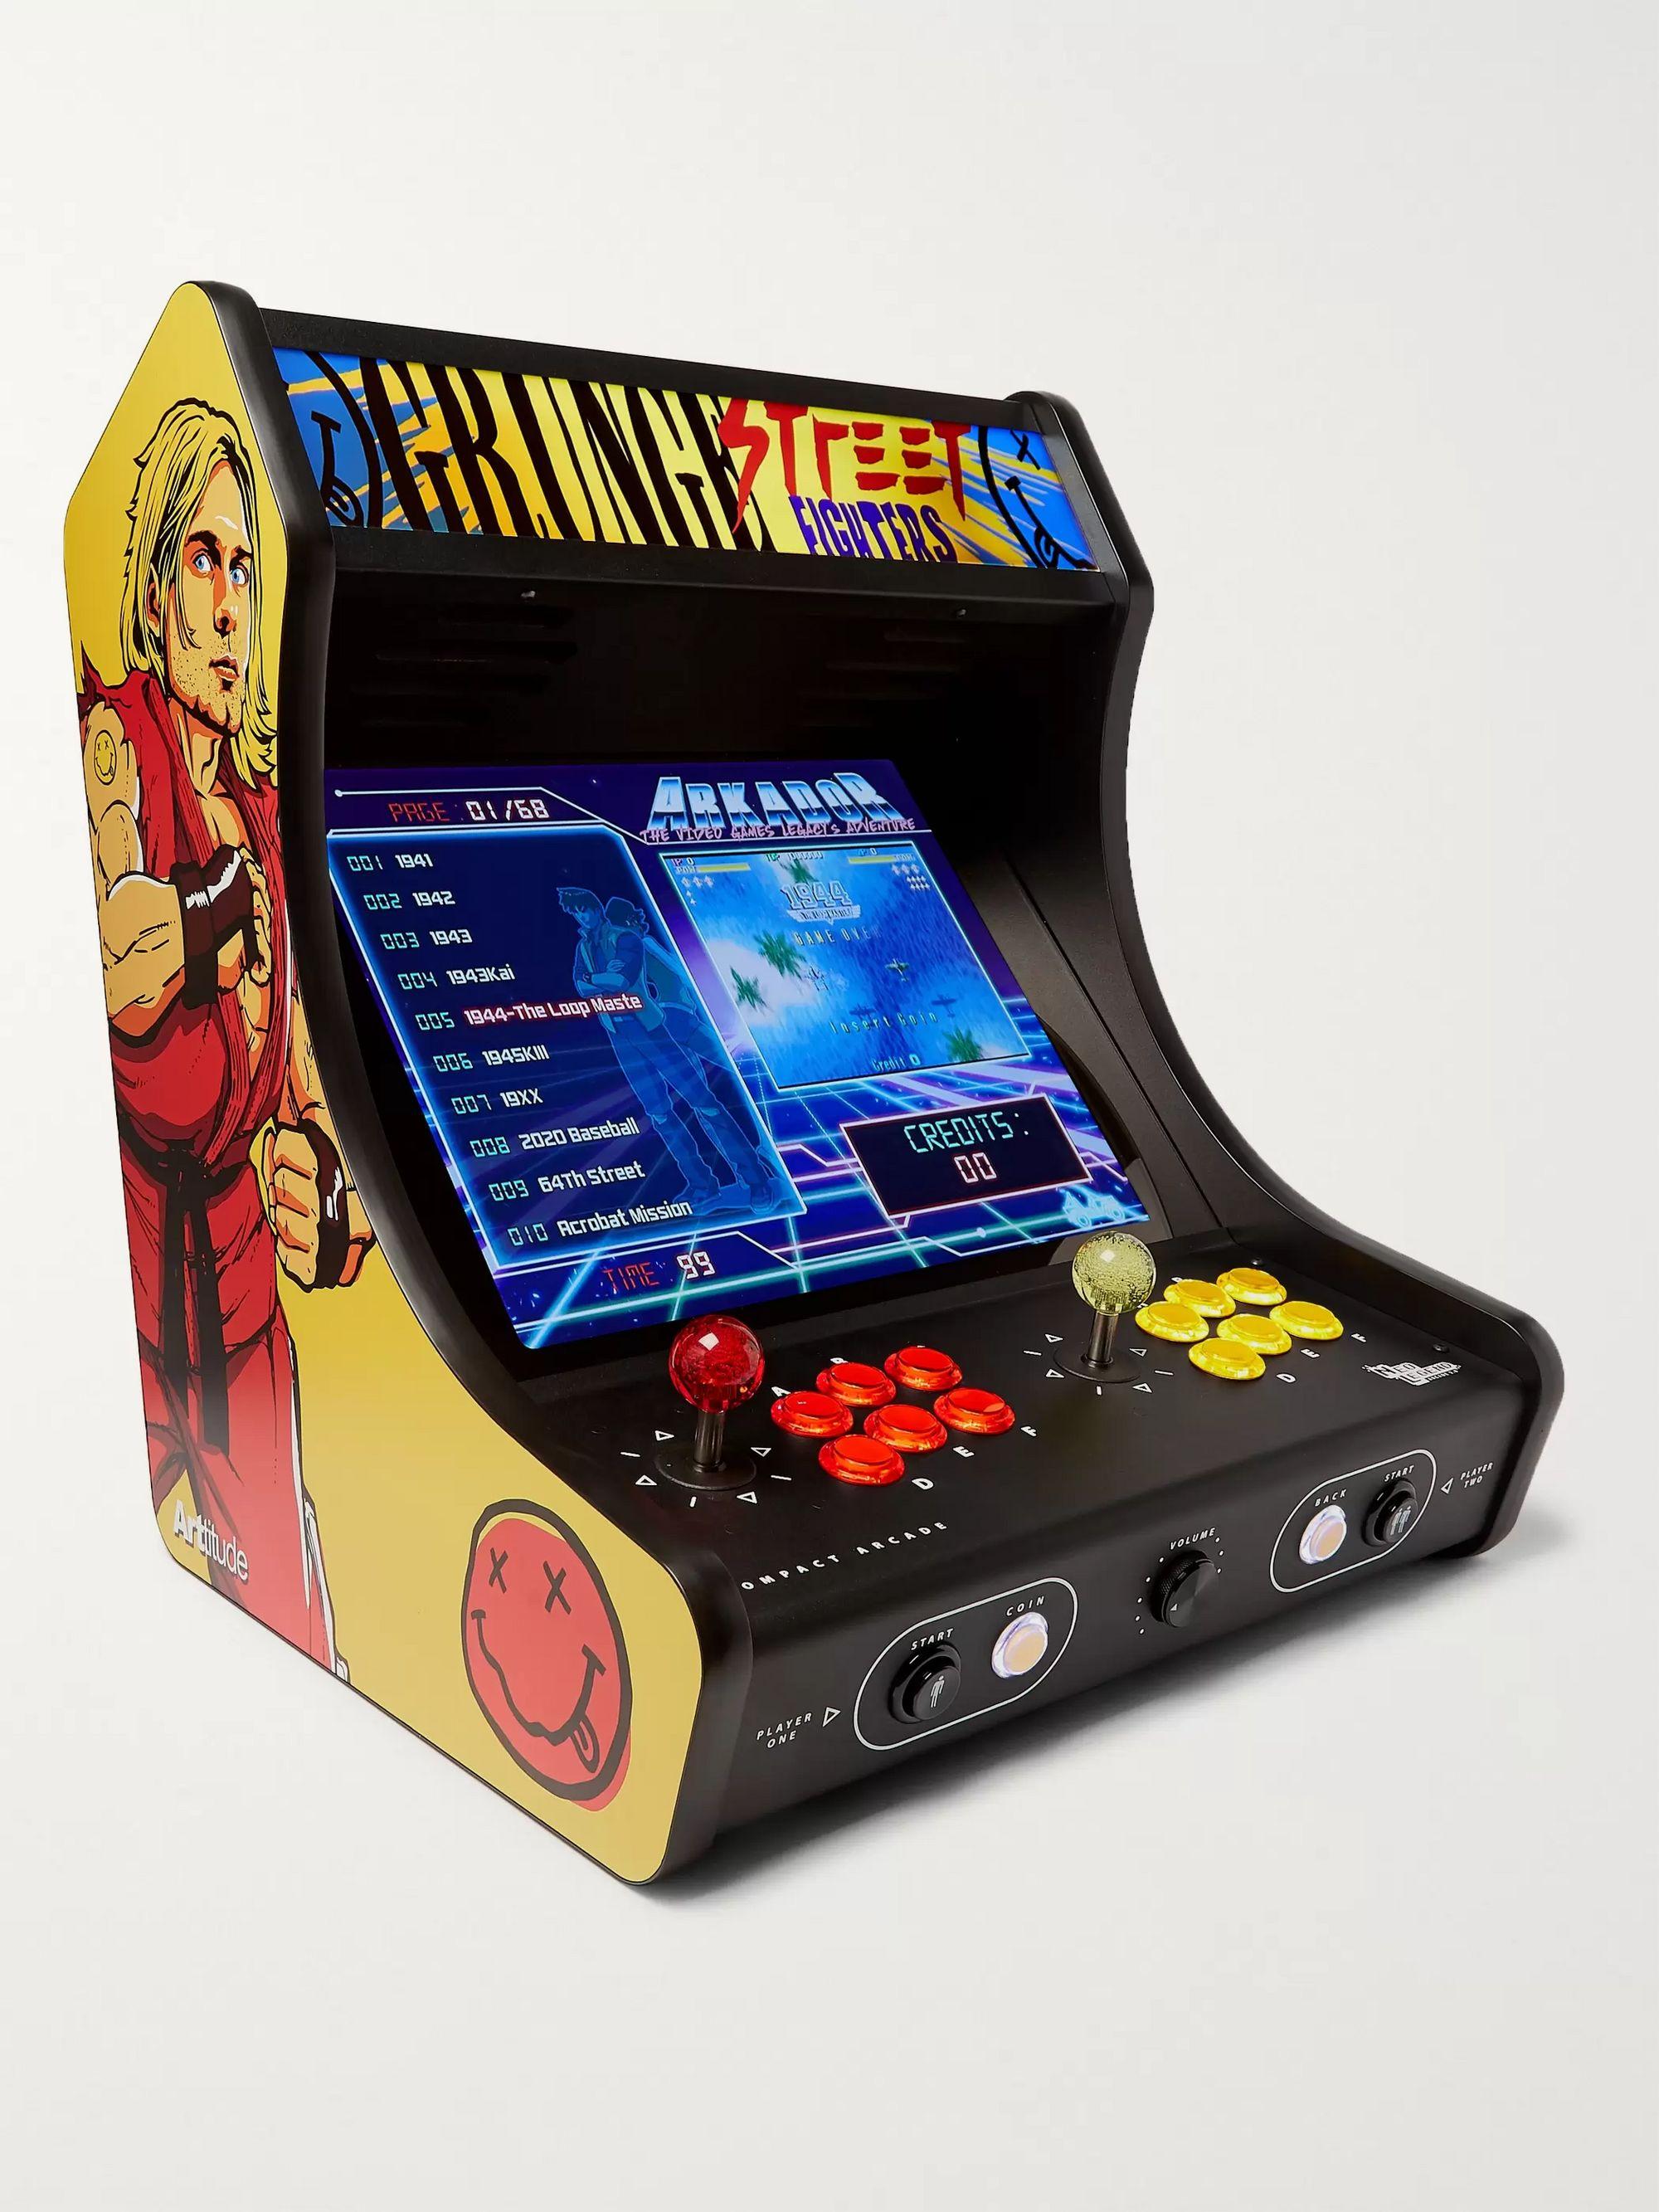 Multi Grunge Street Fighter Compact Arcade Game Neo Legend Mr